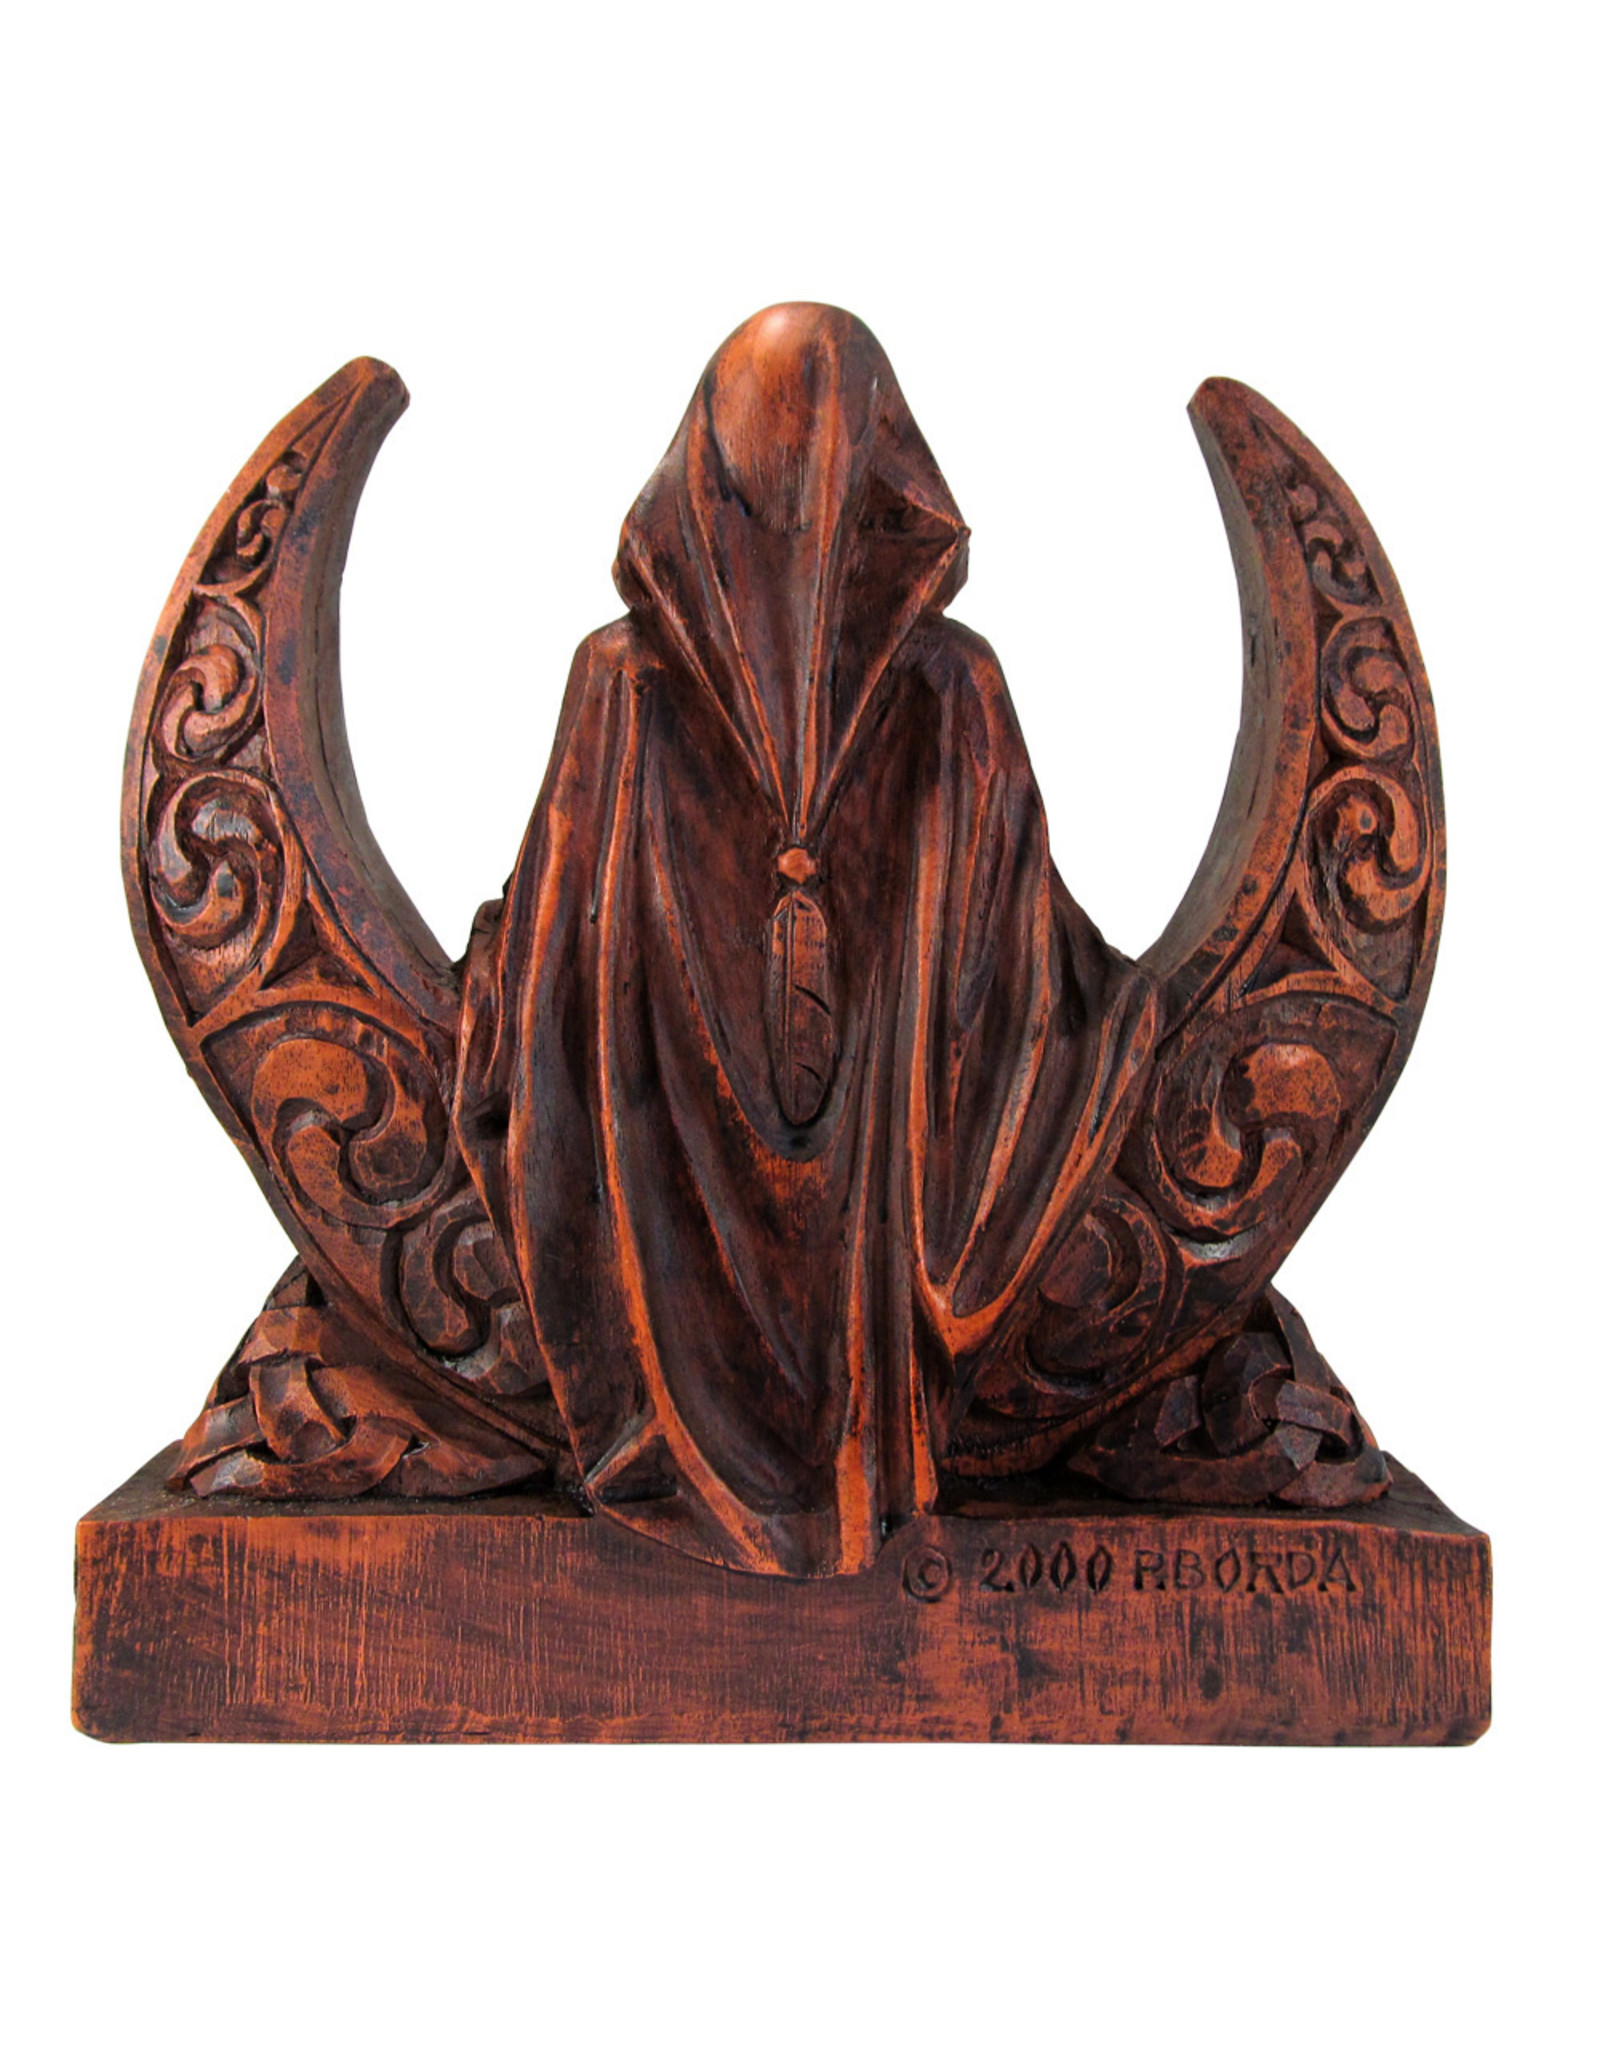 Moon Goddess Statue in Wood Finish